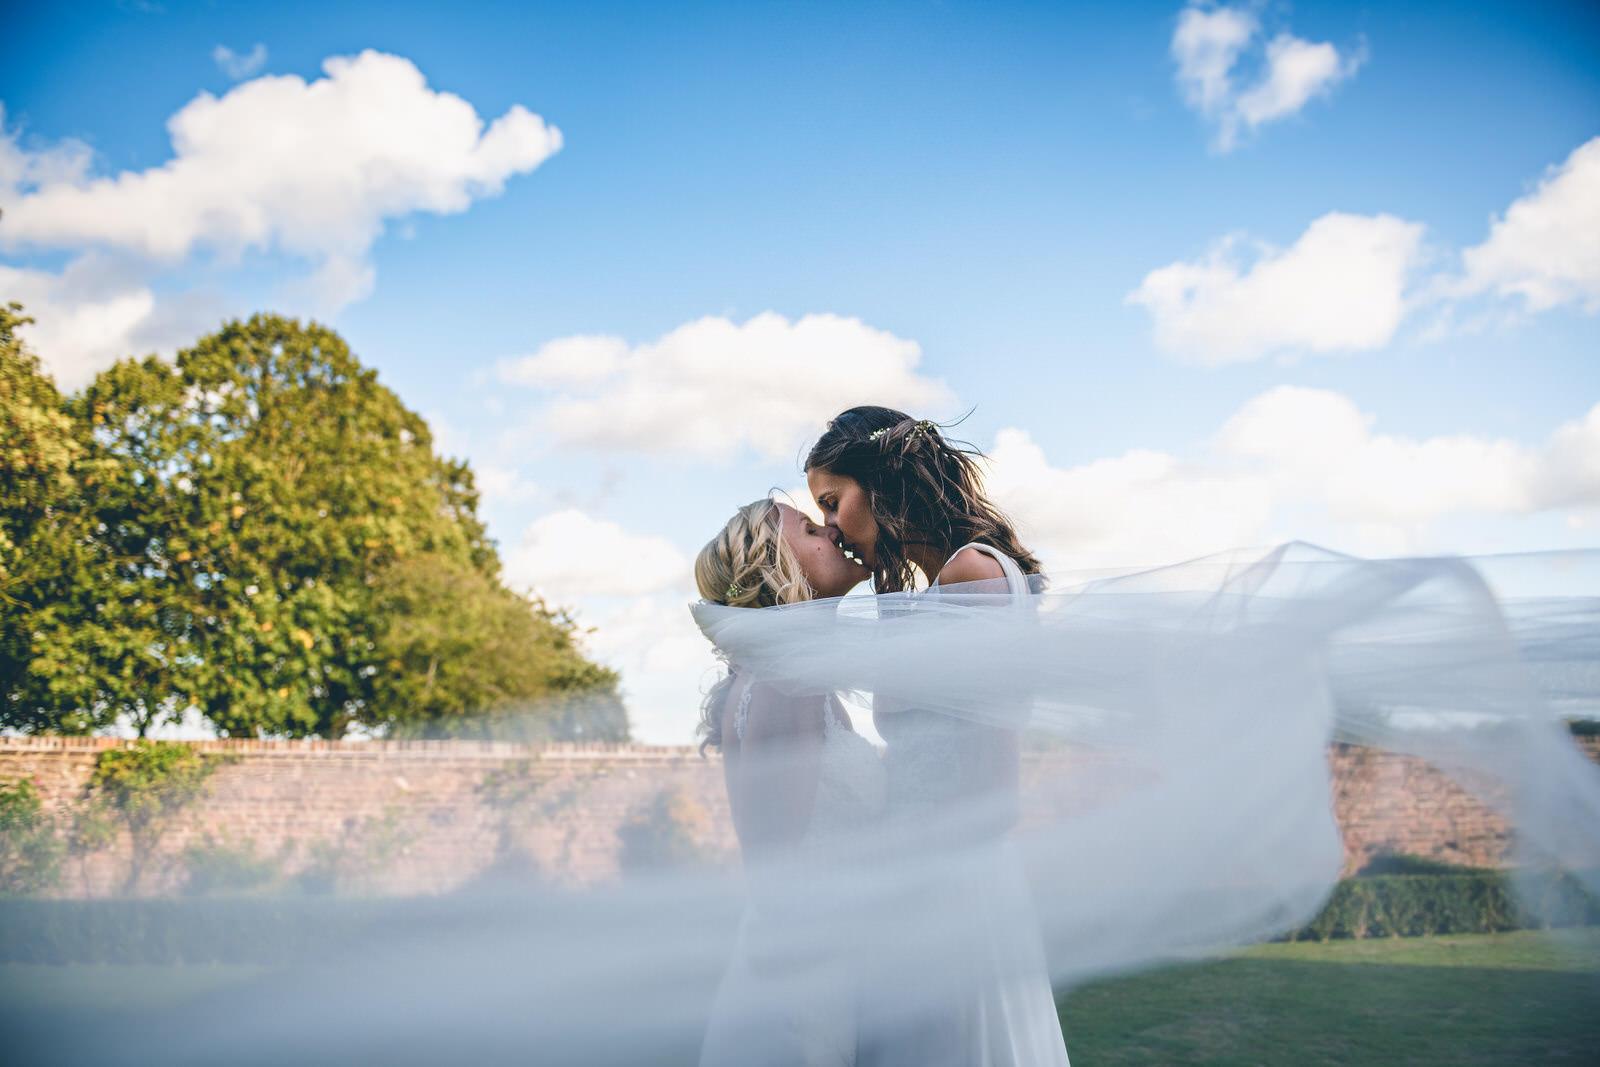 lillebrooke-manor-and-barns-wedding-photography